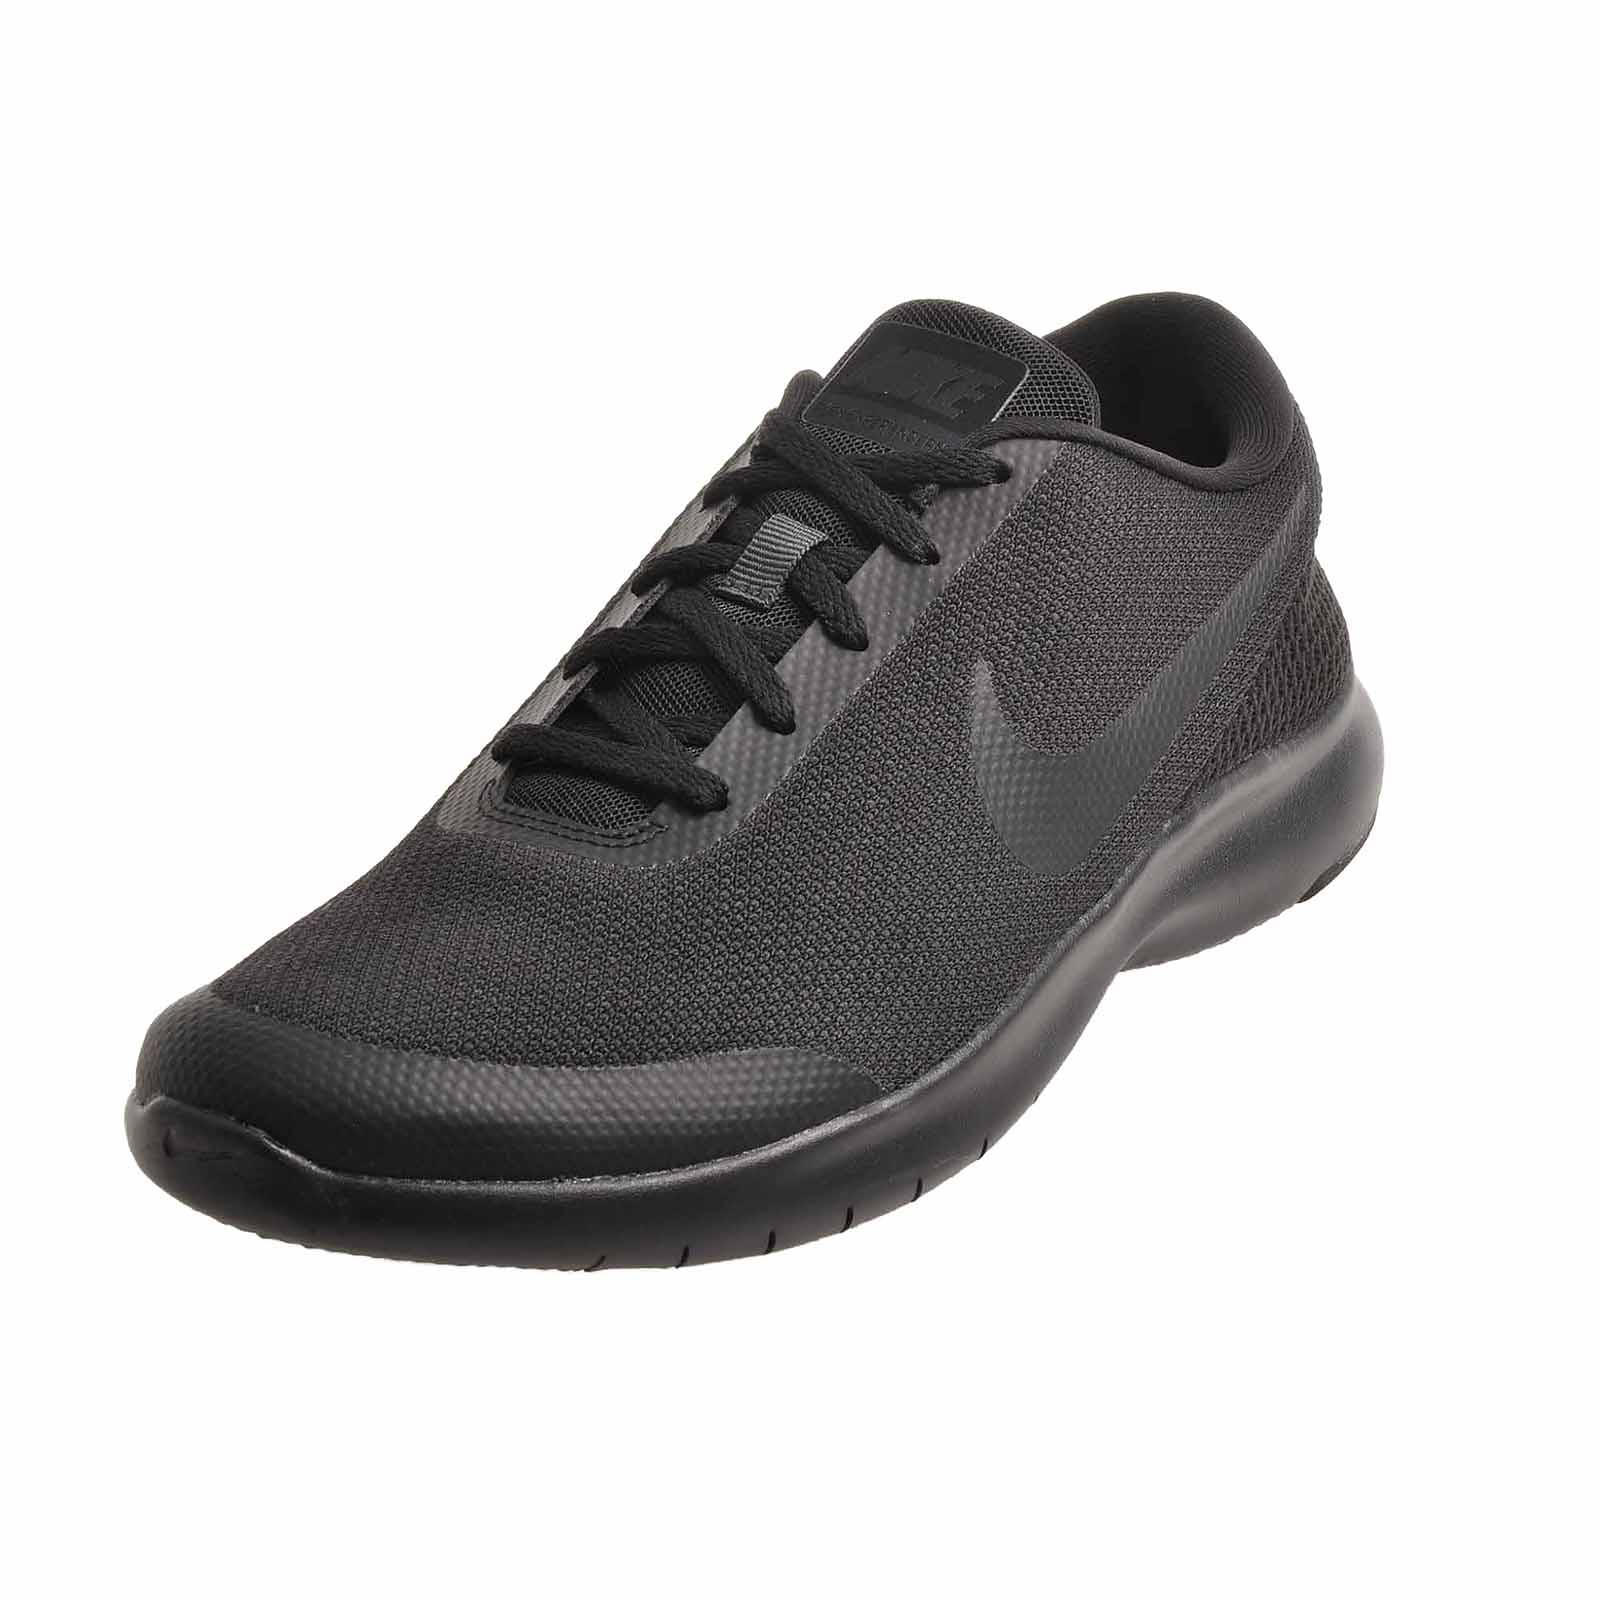 906c9027c4cd0 Nike Flex Experience RN 7 4E Running Mens Shoes Extra Wide Black ...